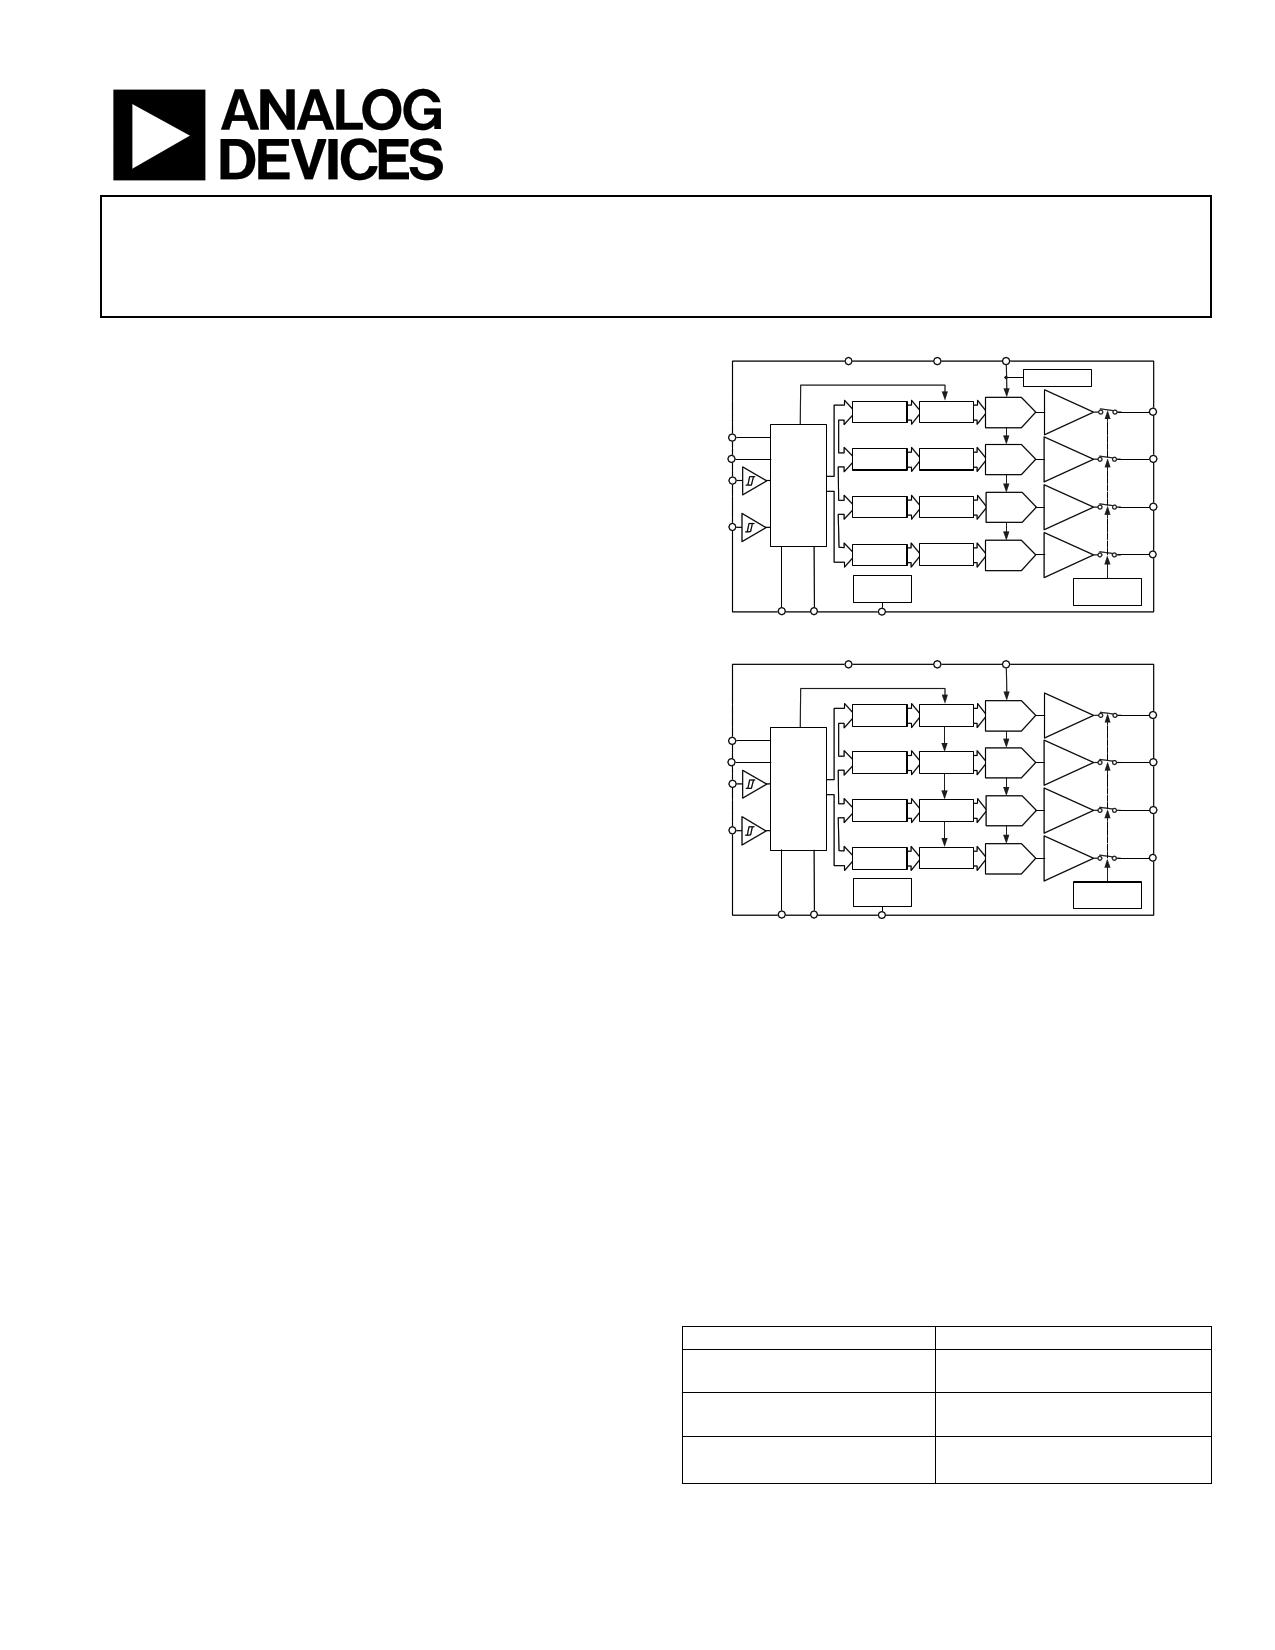 AD5665 datasheet